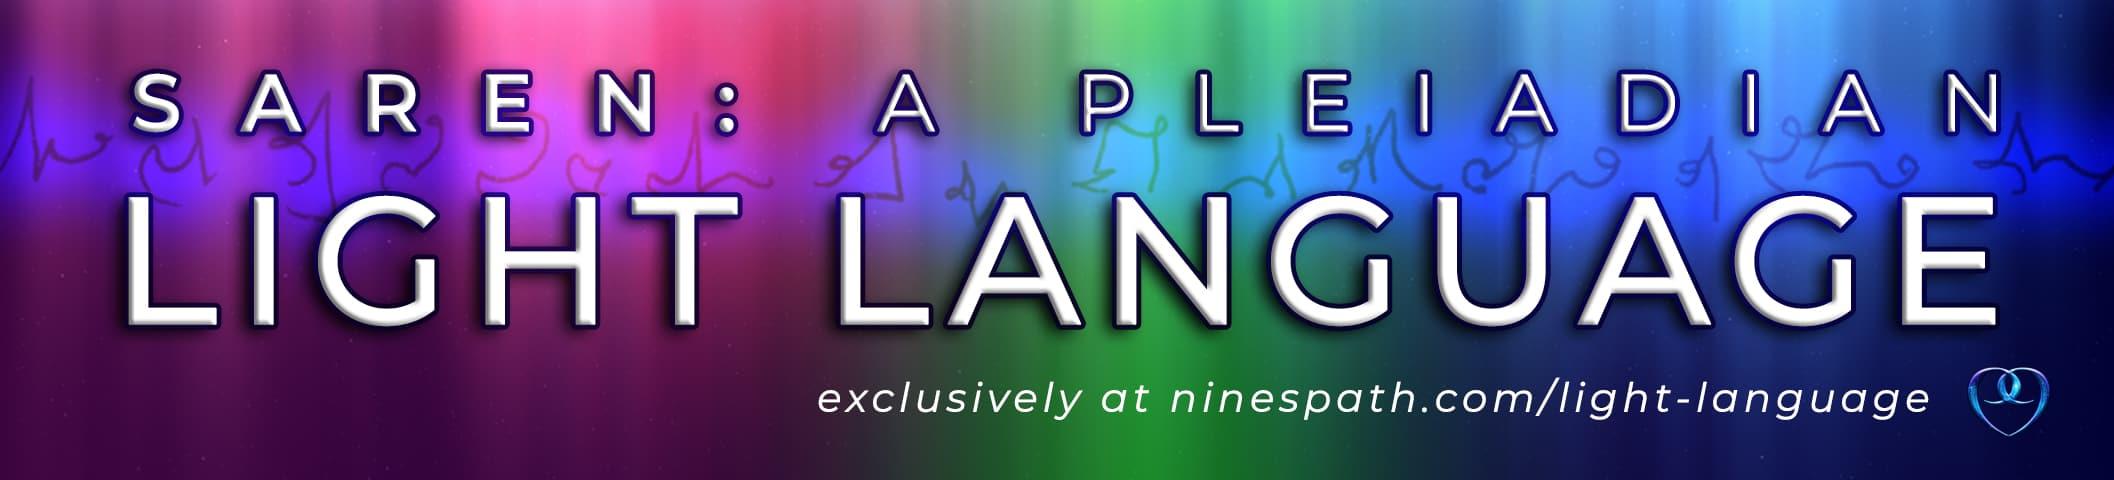 Nine's Path Saren divine Pleiadian light language